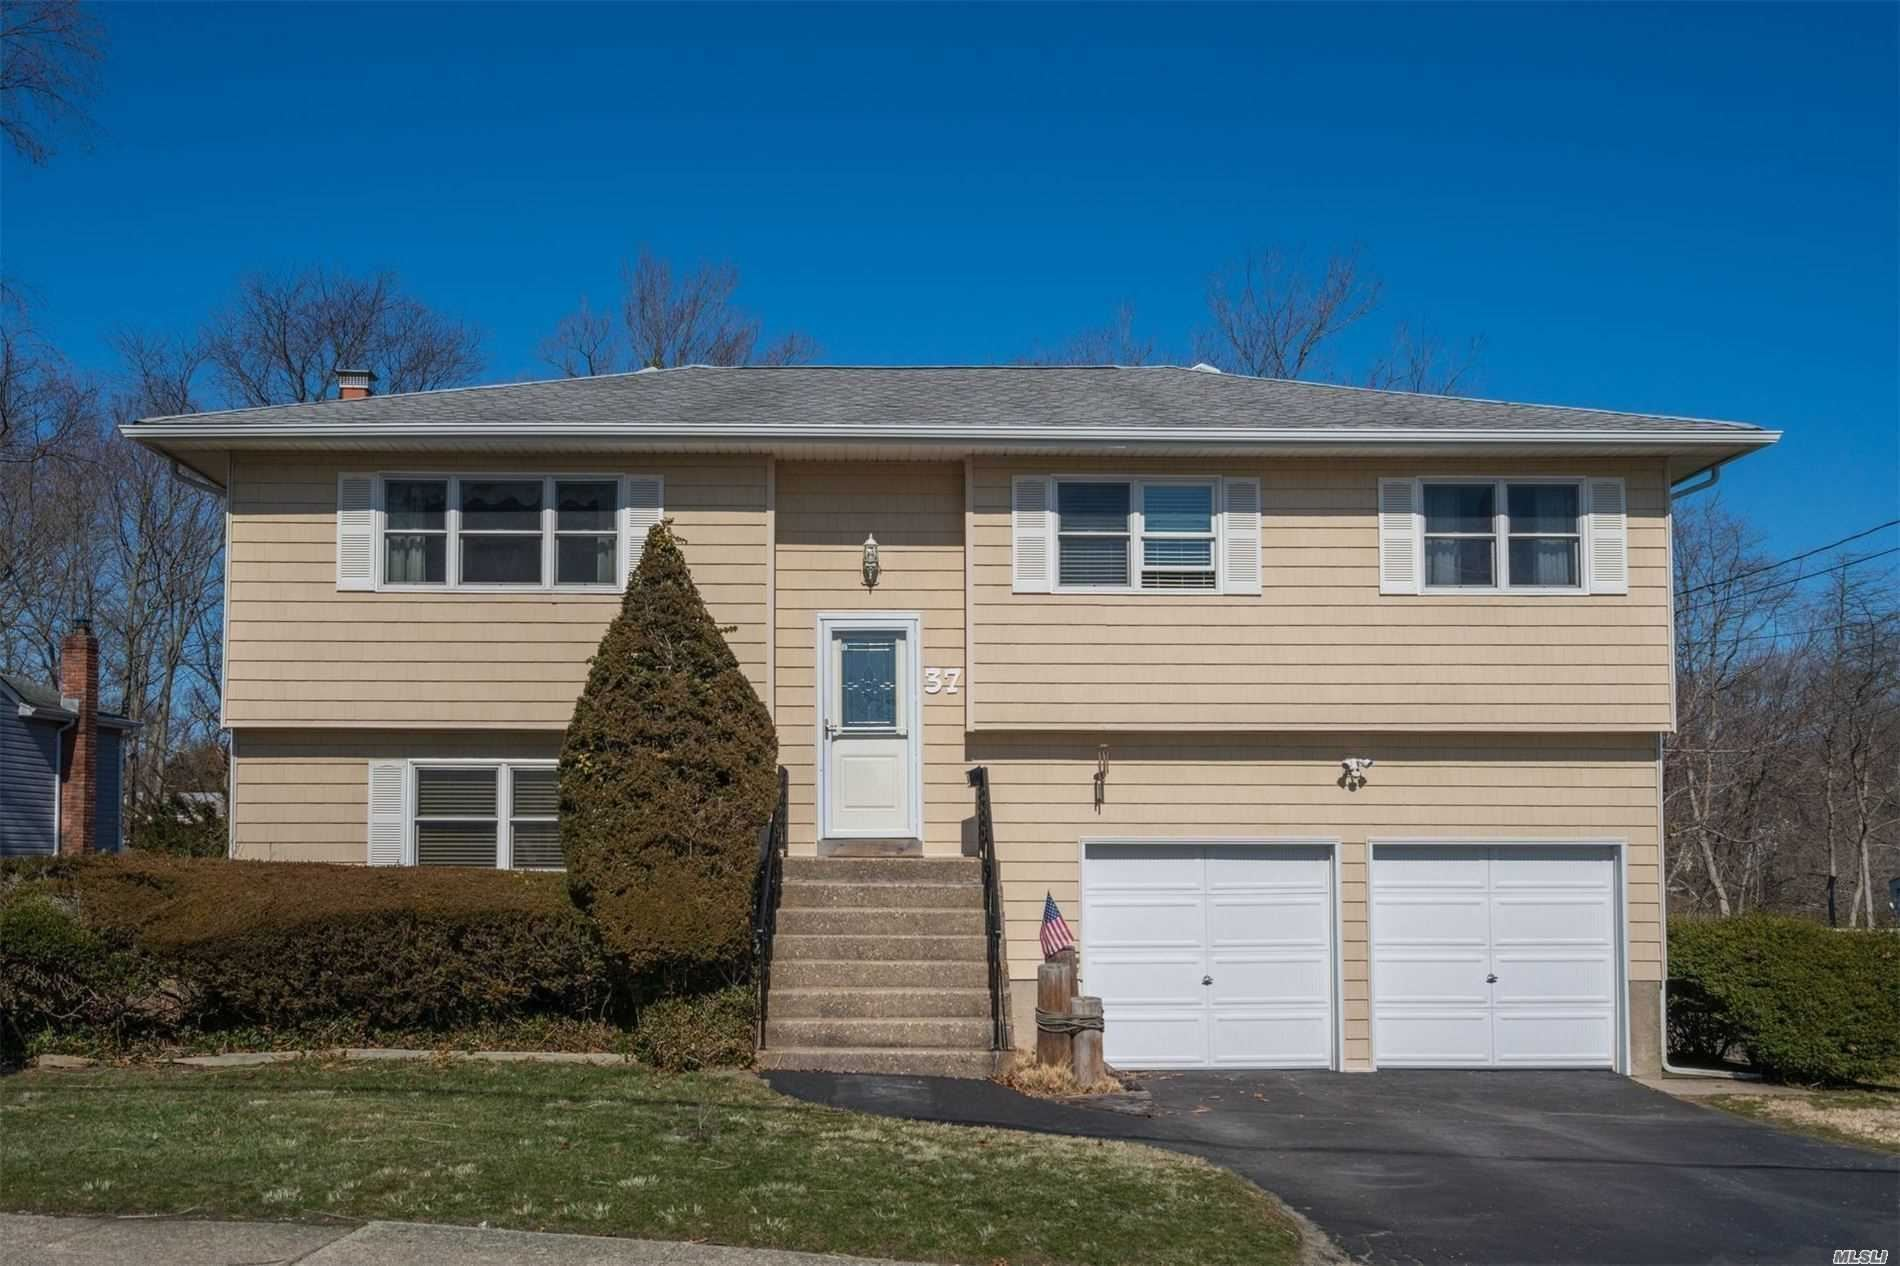 37 Aldrich St, Sayville, NY 11782 - MLS#: 3203273